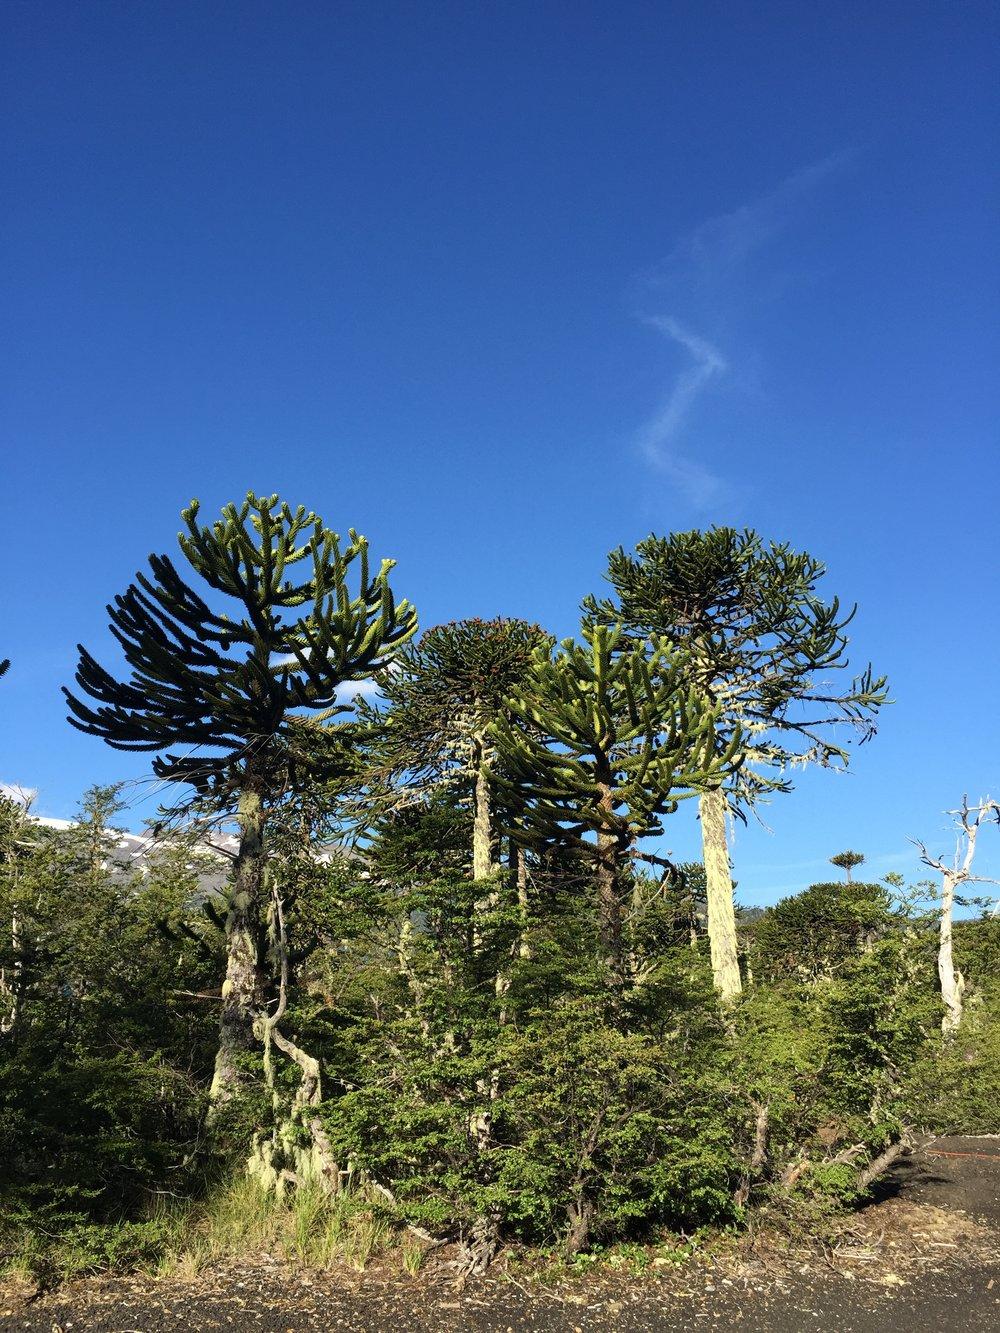 Araucaria trees Conguillio National Park with Samadhi Eco Resort Chile